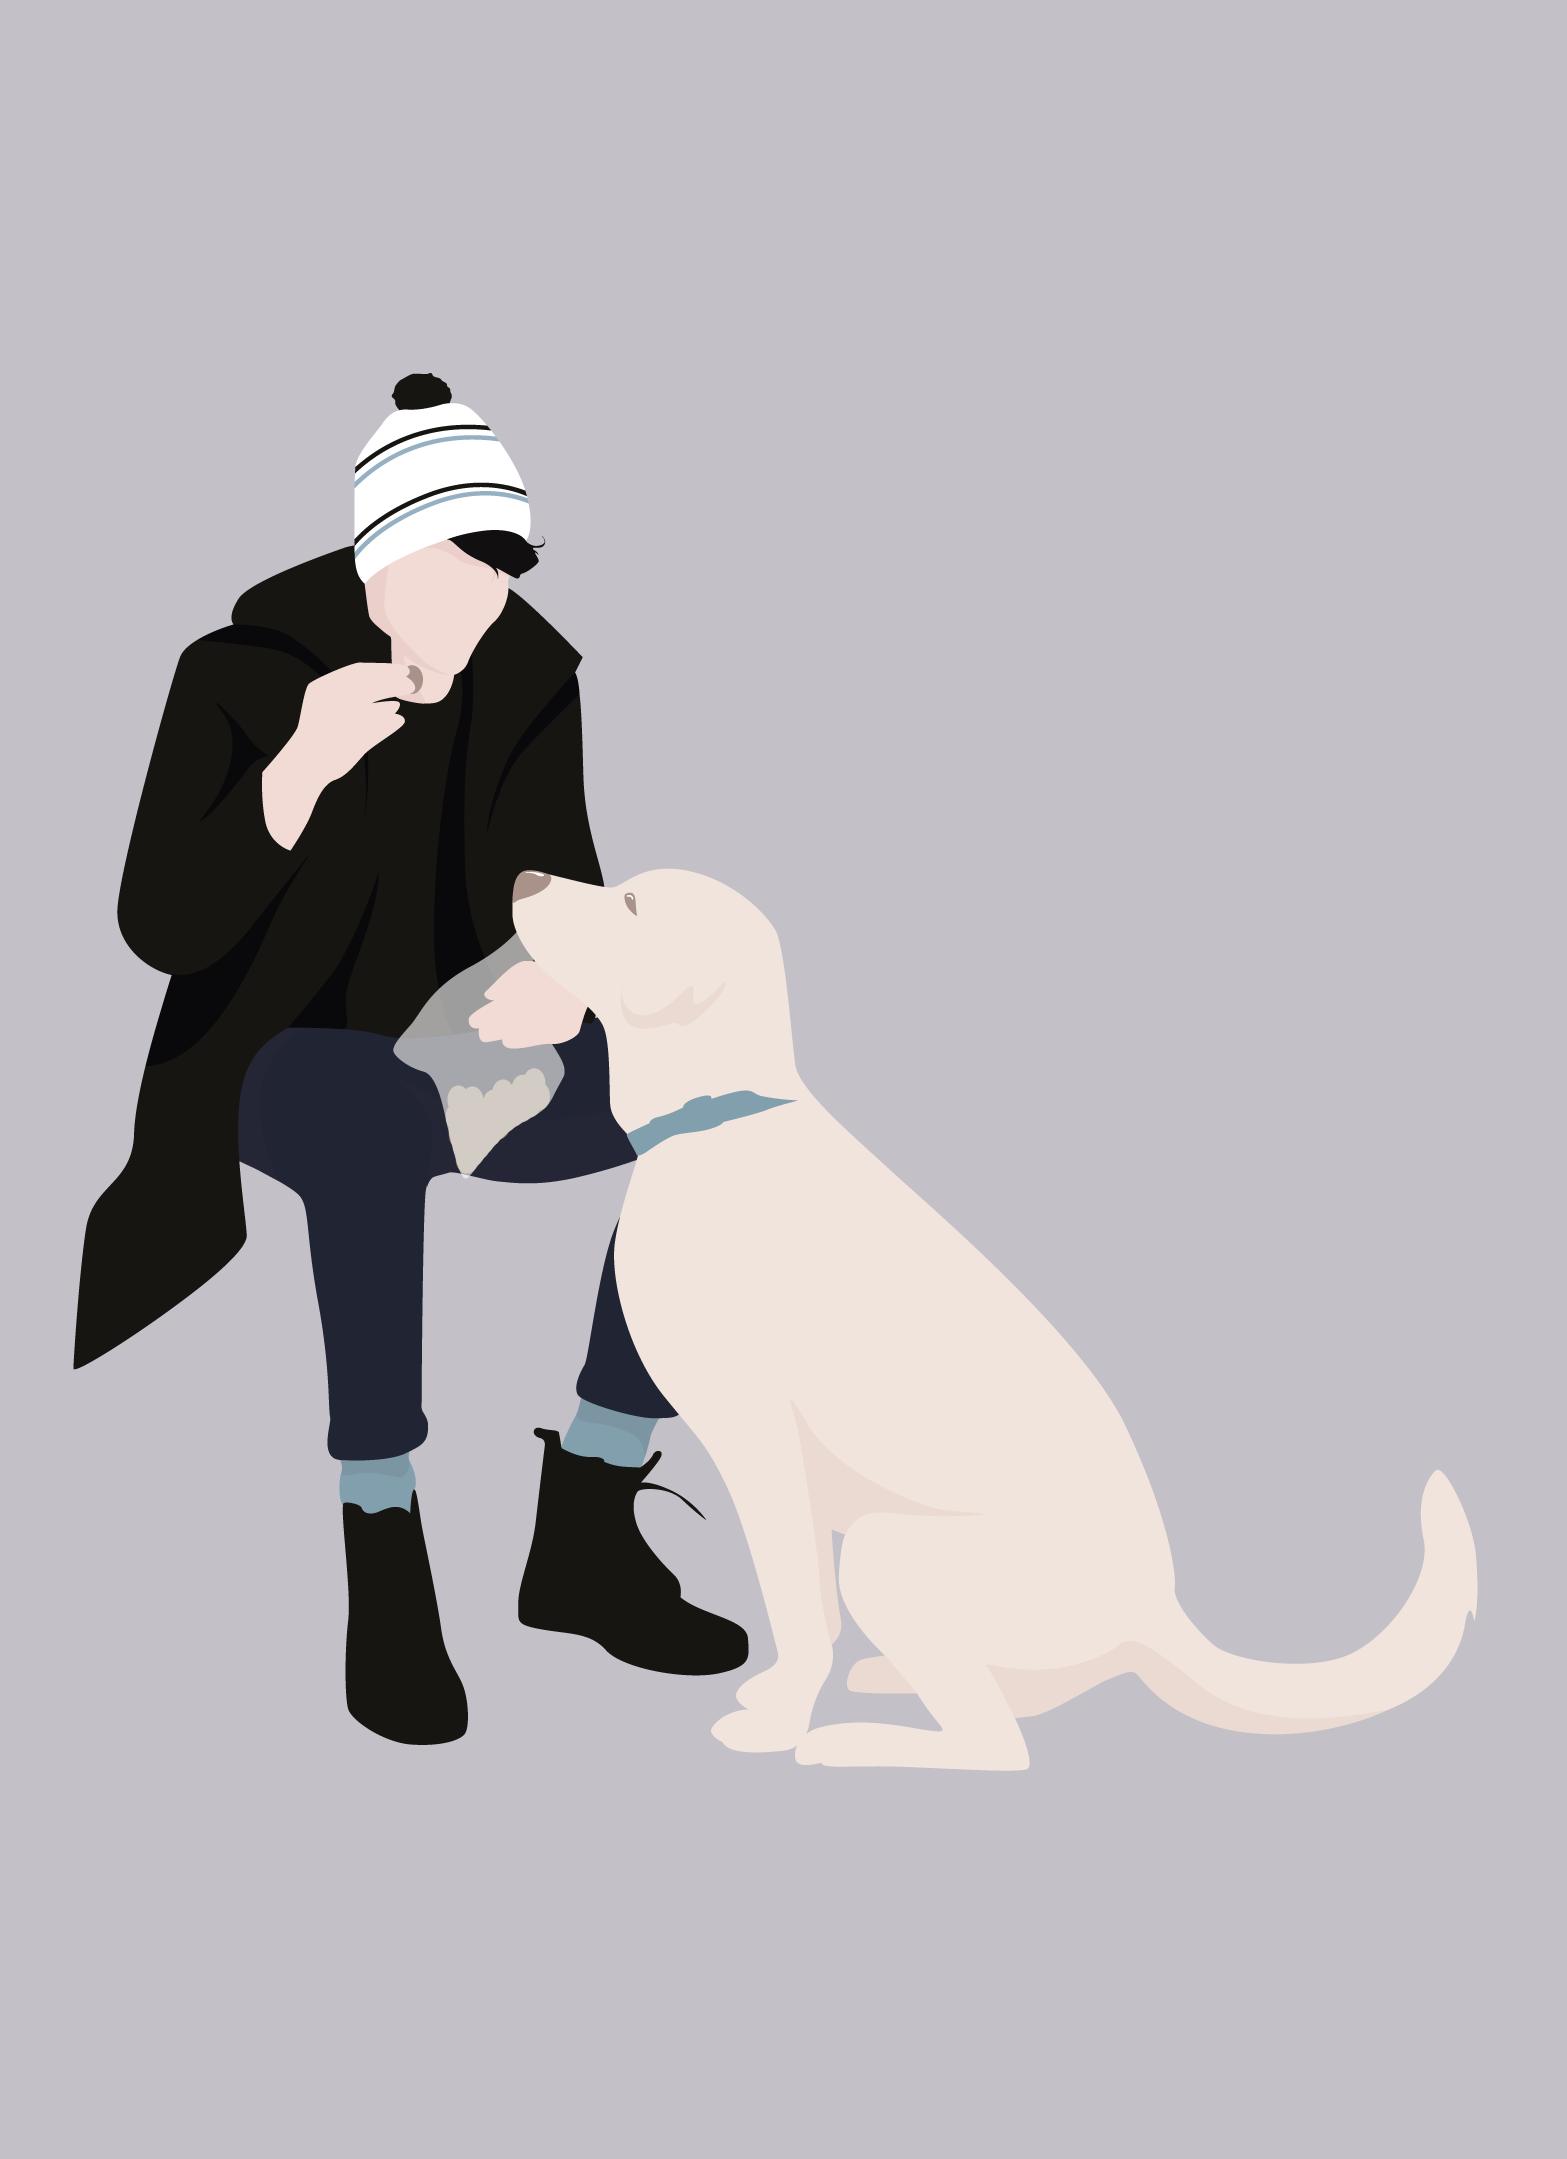 Flat Vector Proud Dog Owner Illustration Drawing People People Illustration Illustration